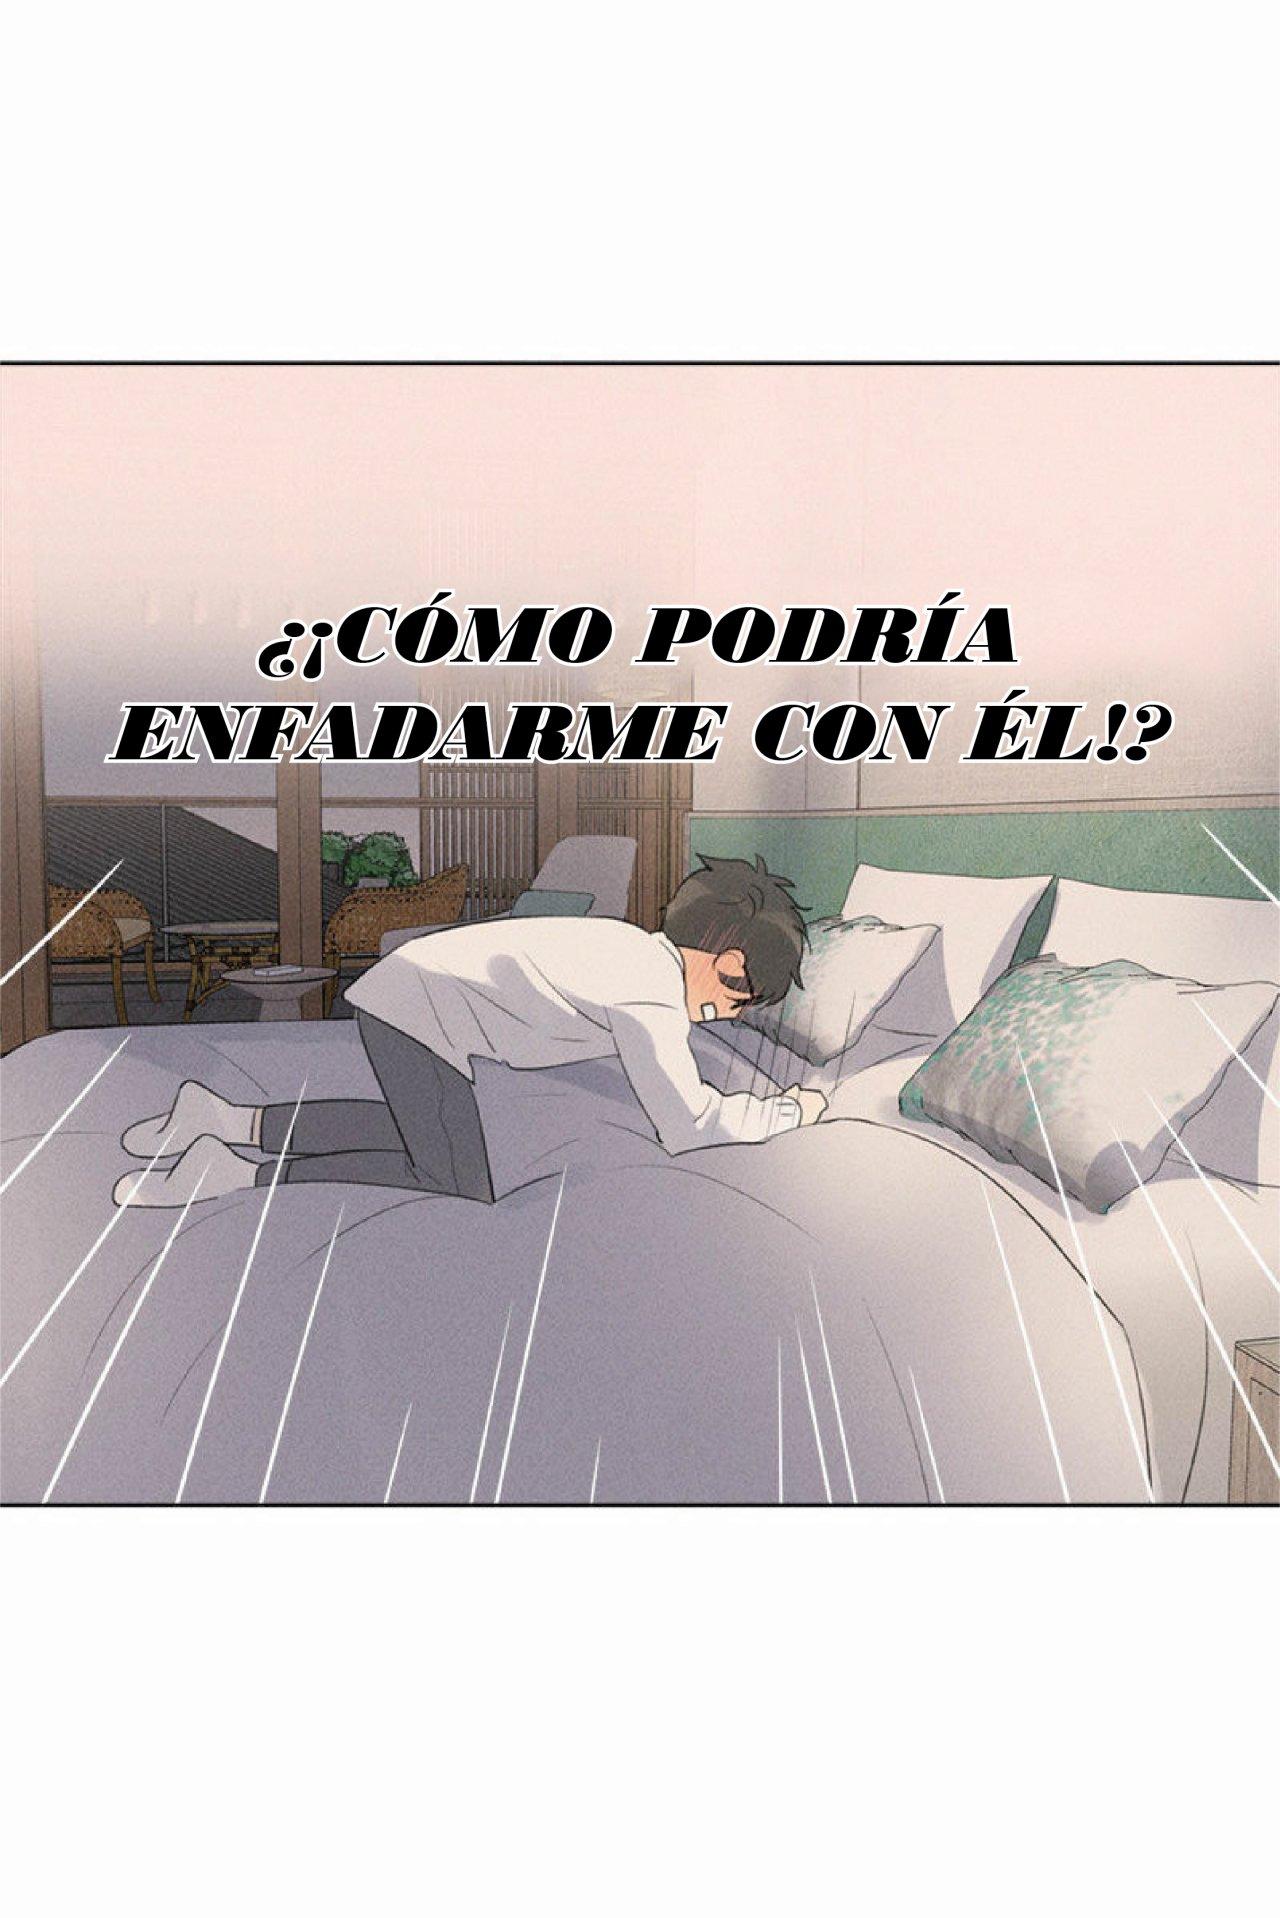 https://nine.mangadogs.com/es_manga/pic8/29/24925/946329/8c22d6f99007d77ad122b1de7e5ce6c3.jpg Page 49